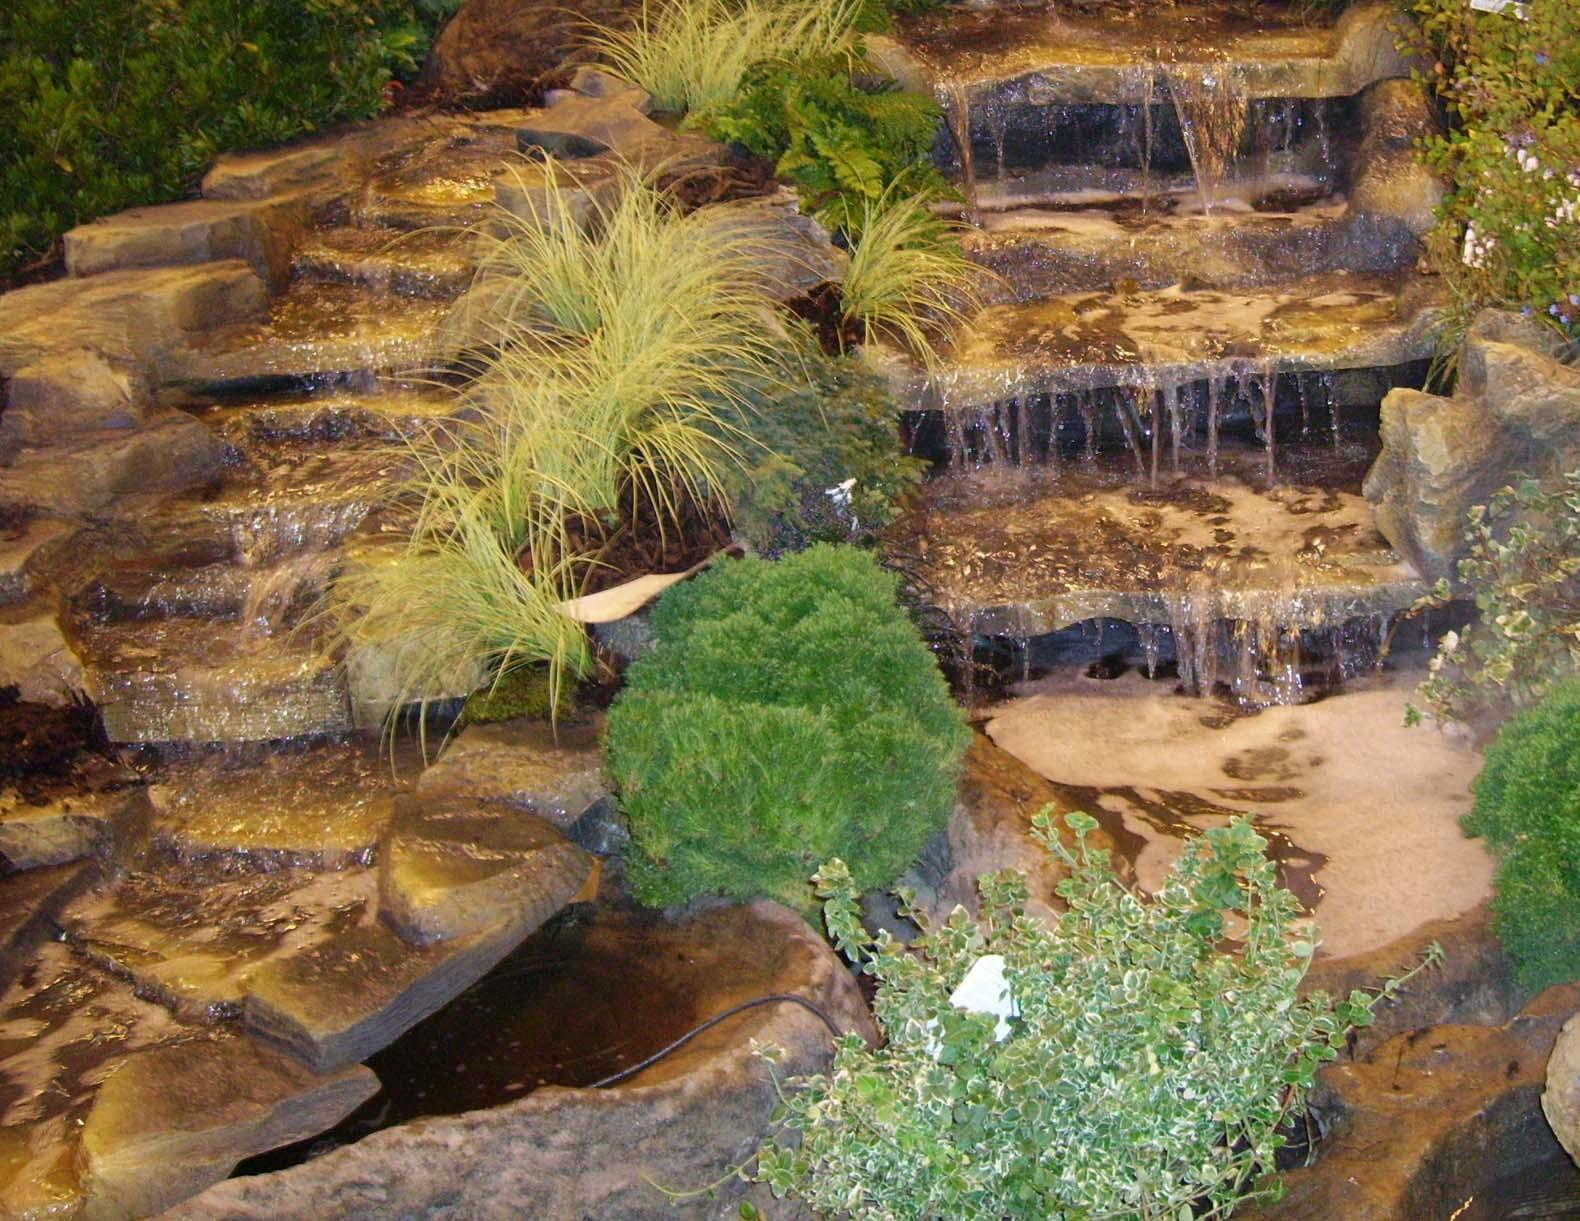 Comment Construire Sa Cascade ? - Expert Bassin concernant Creation Cascade Bassin Jardin